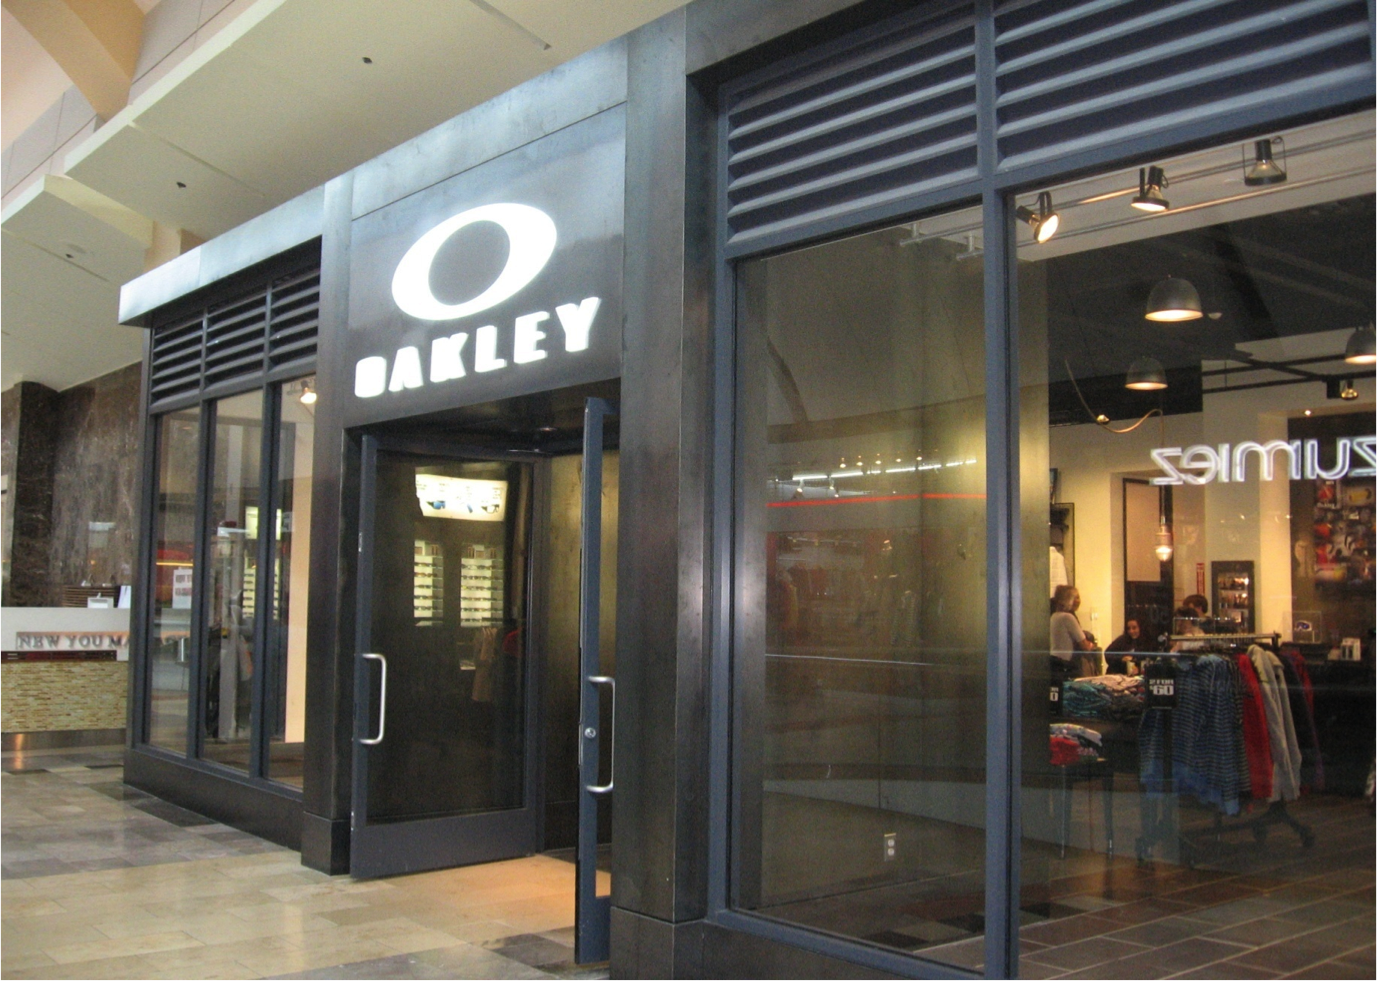 Oakley Store In Paramus Nj 07652